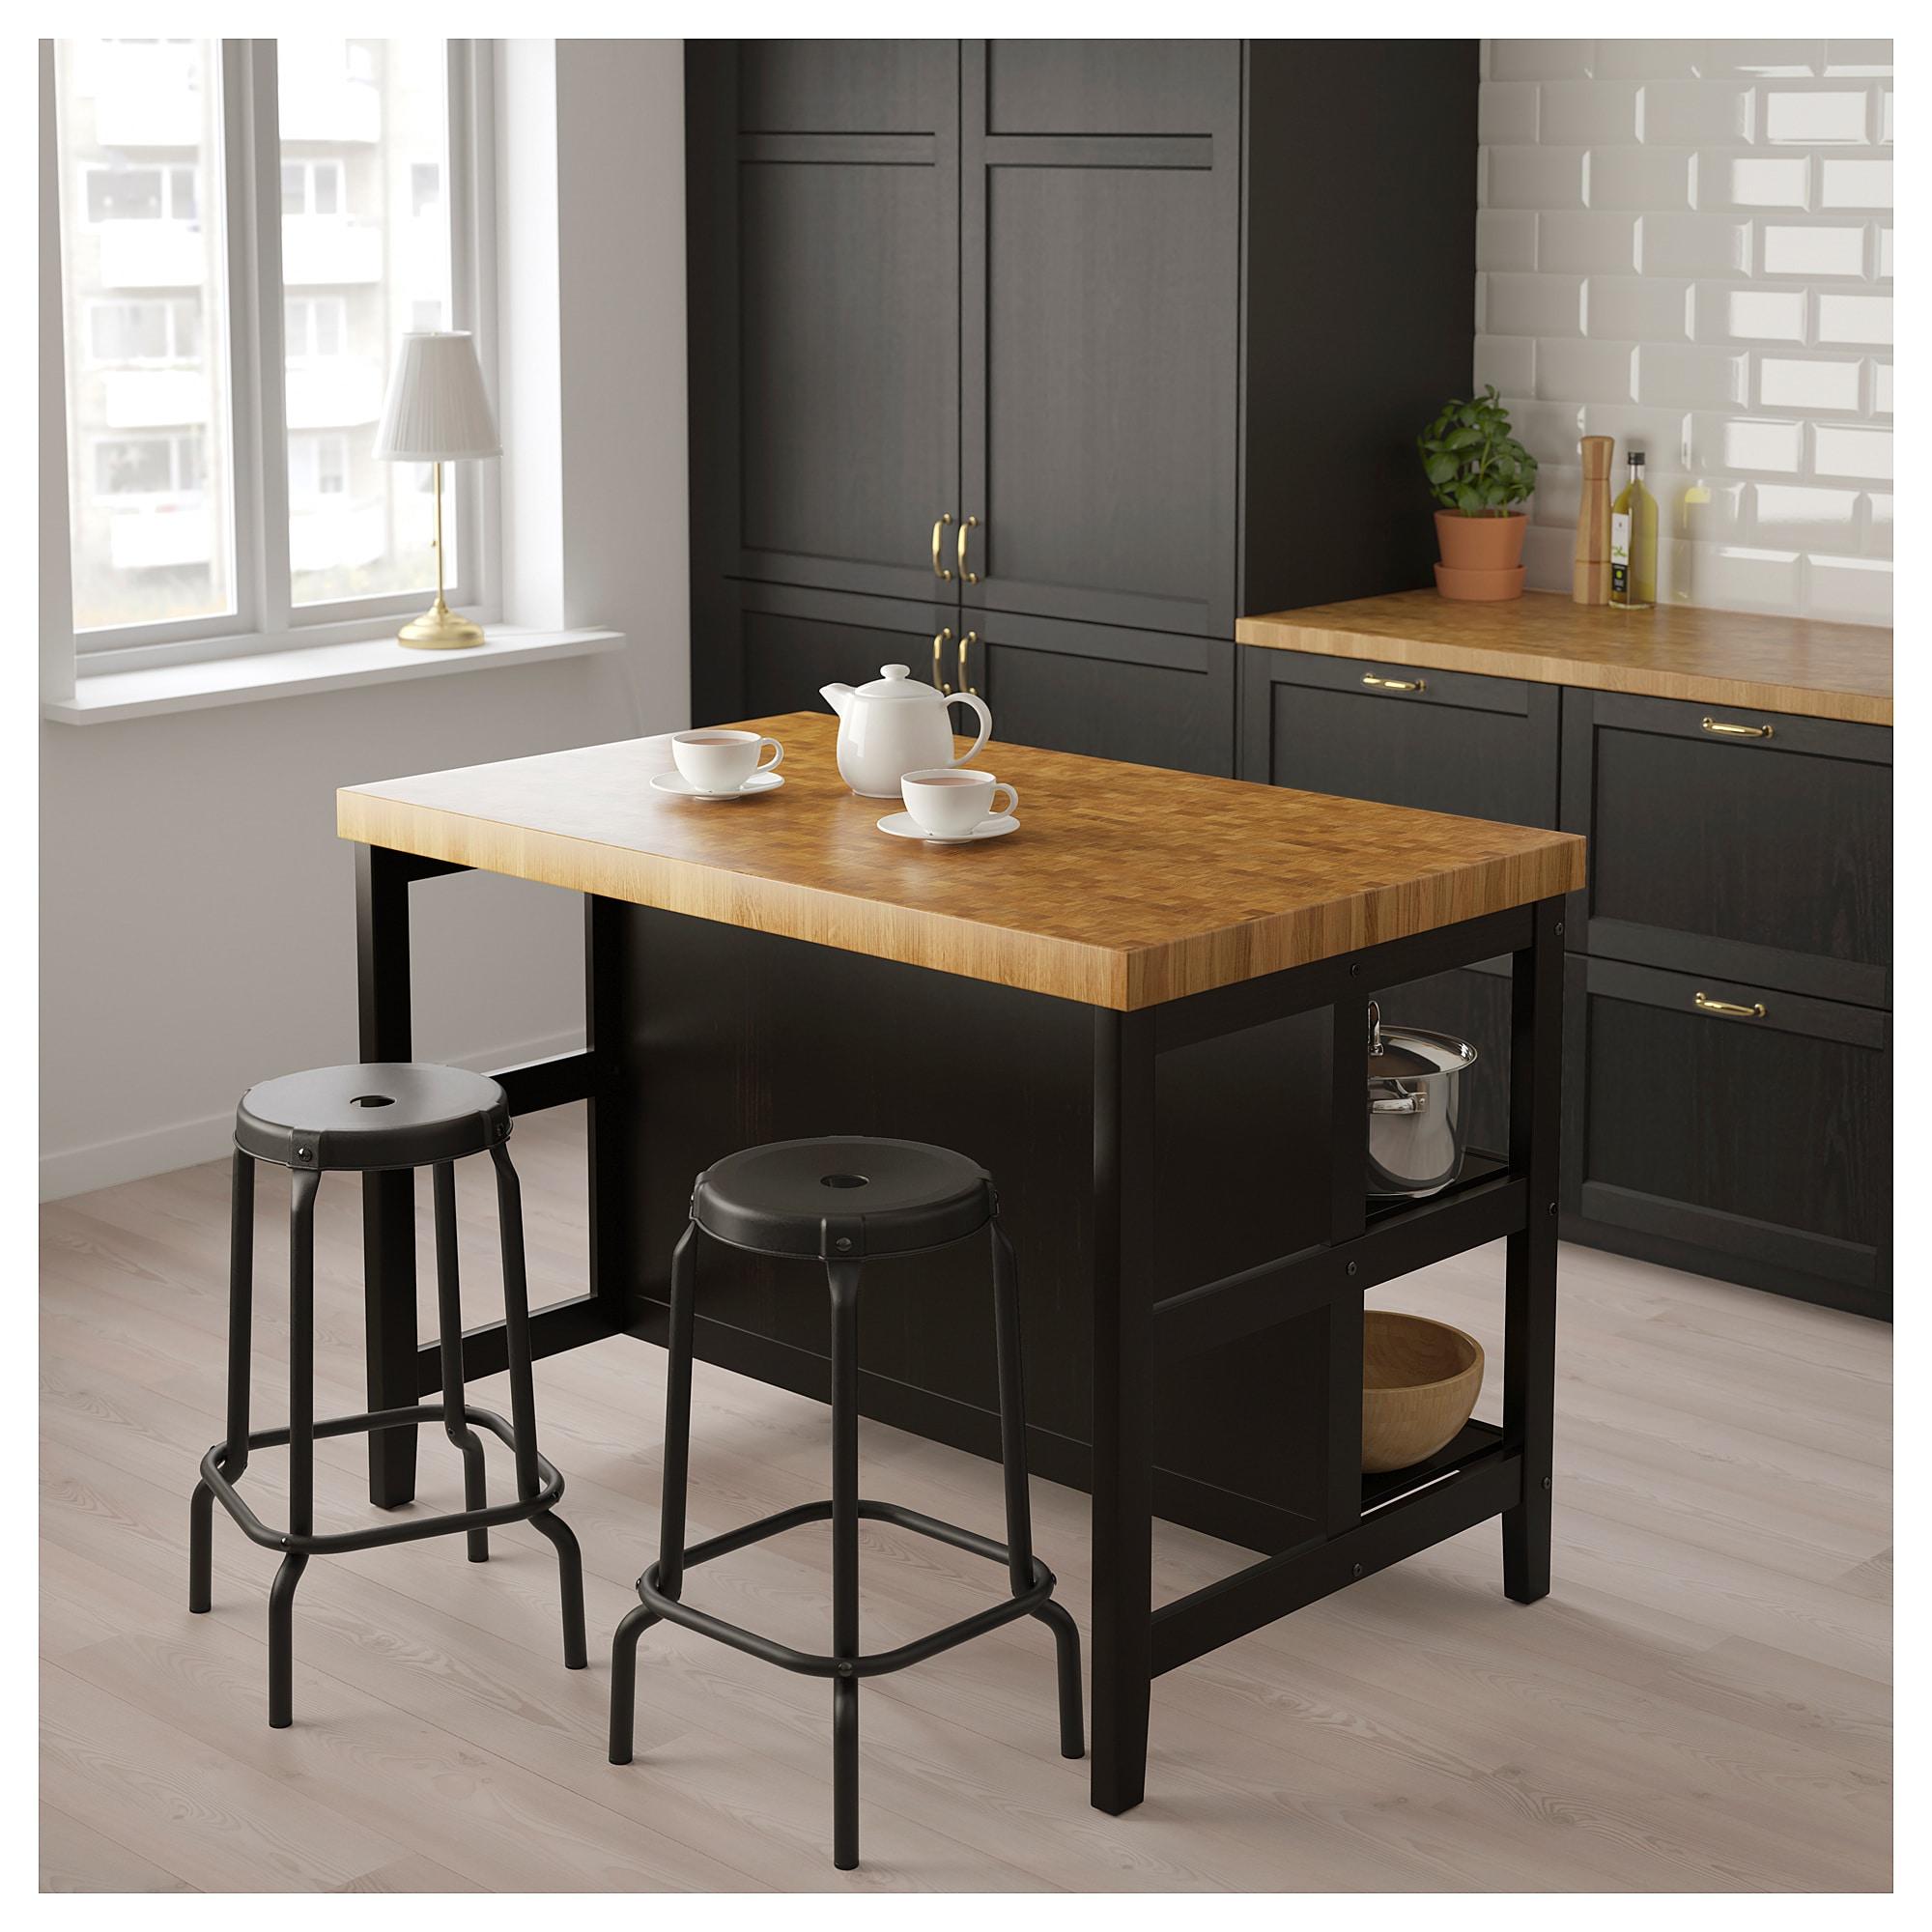 Vadholma Kitchen Island Black Oak 49 5 8x31 1 8x35 3 8